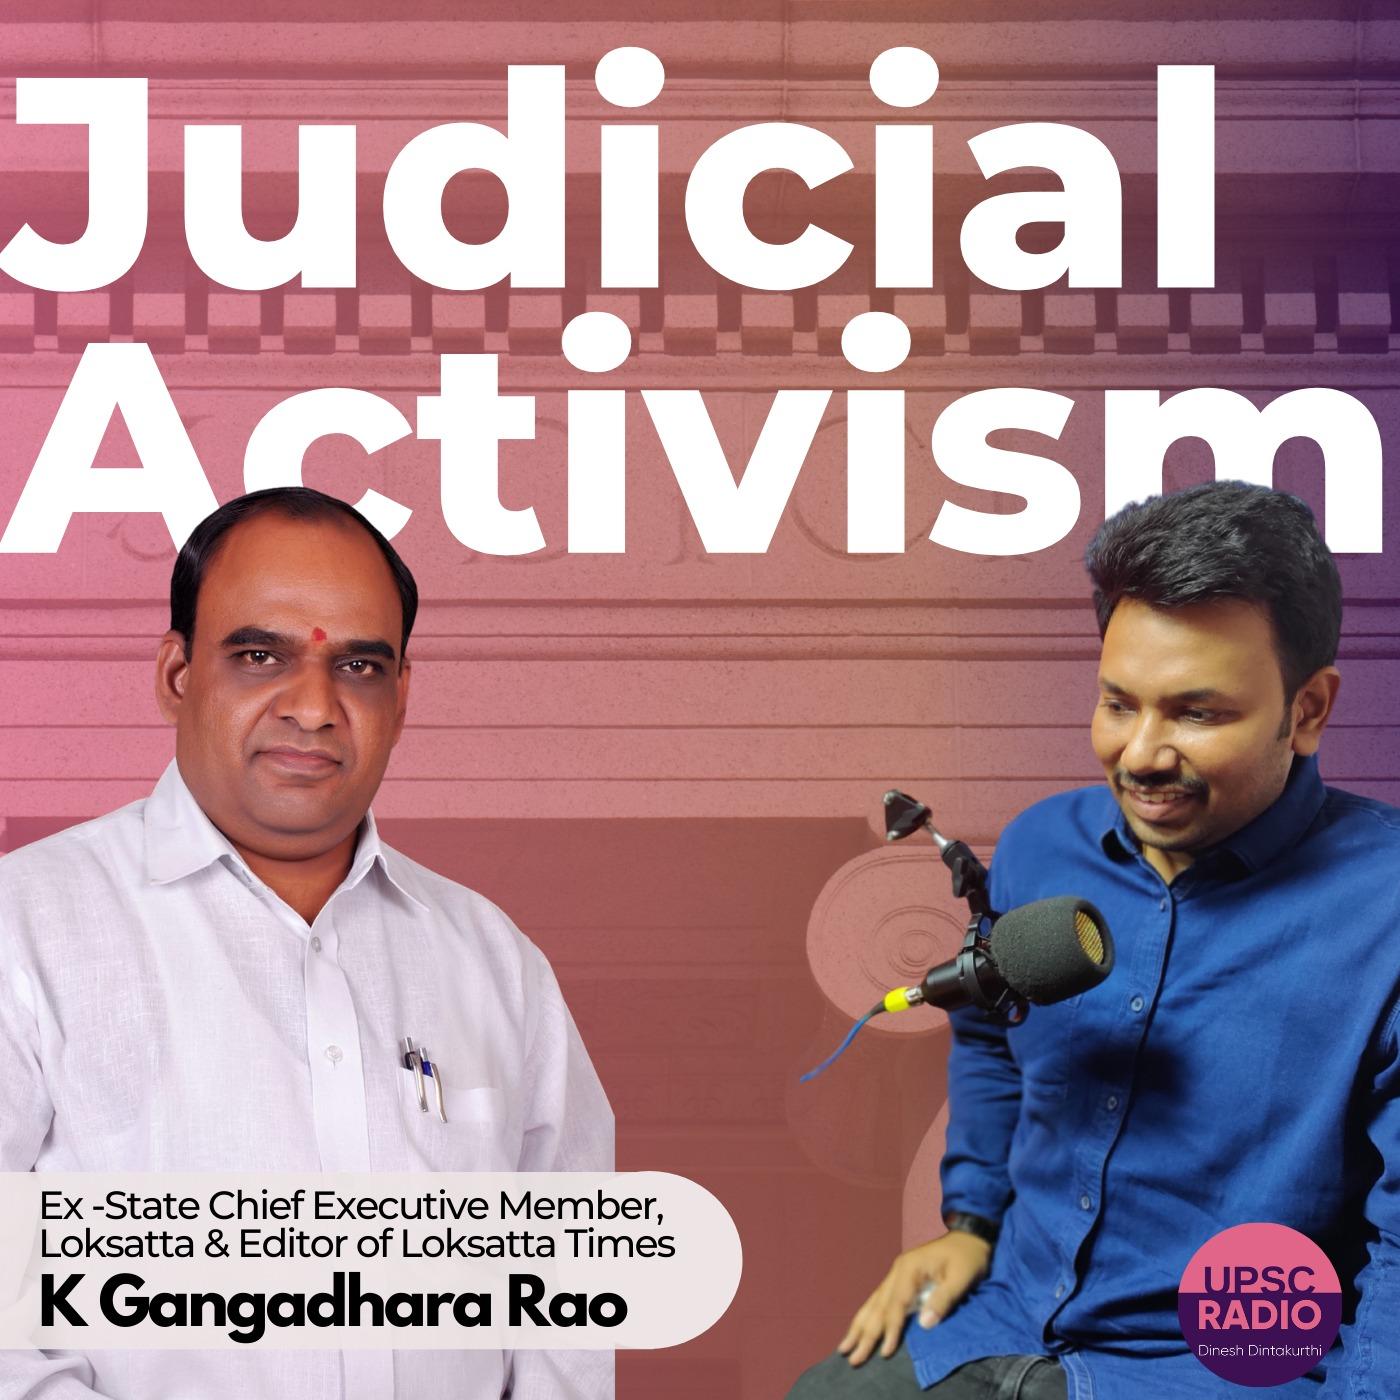 Judicial Activism with K Gangadhar Rao Ex Loksatta Member, UPSC Faculty